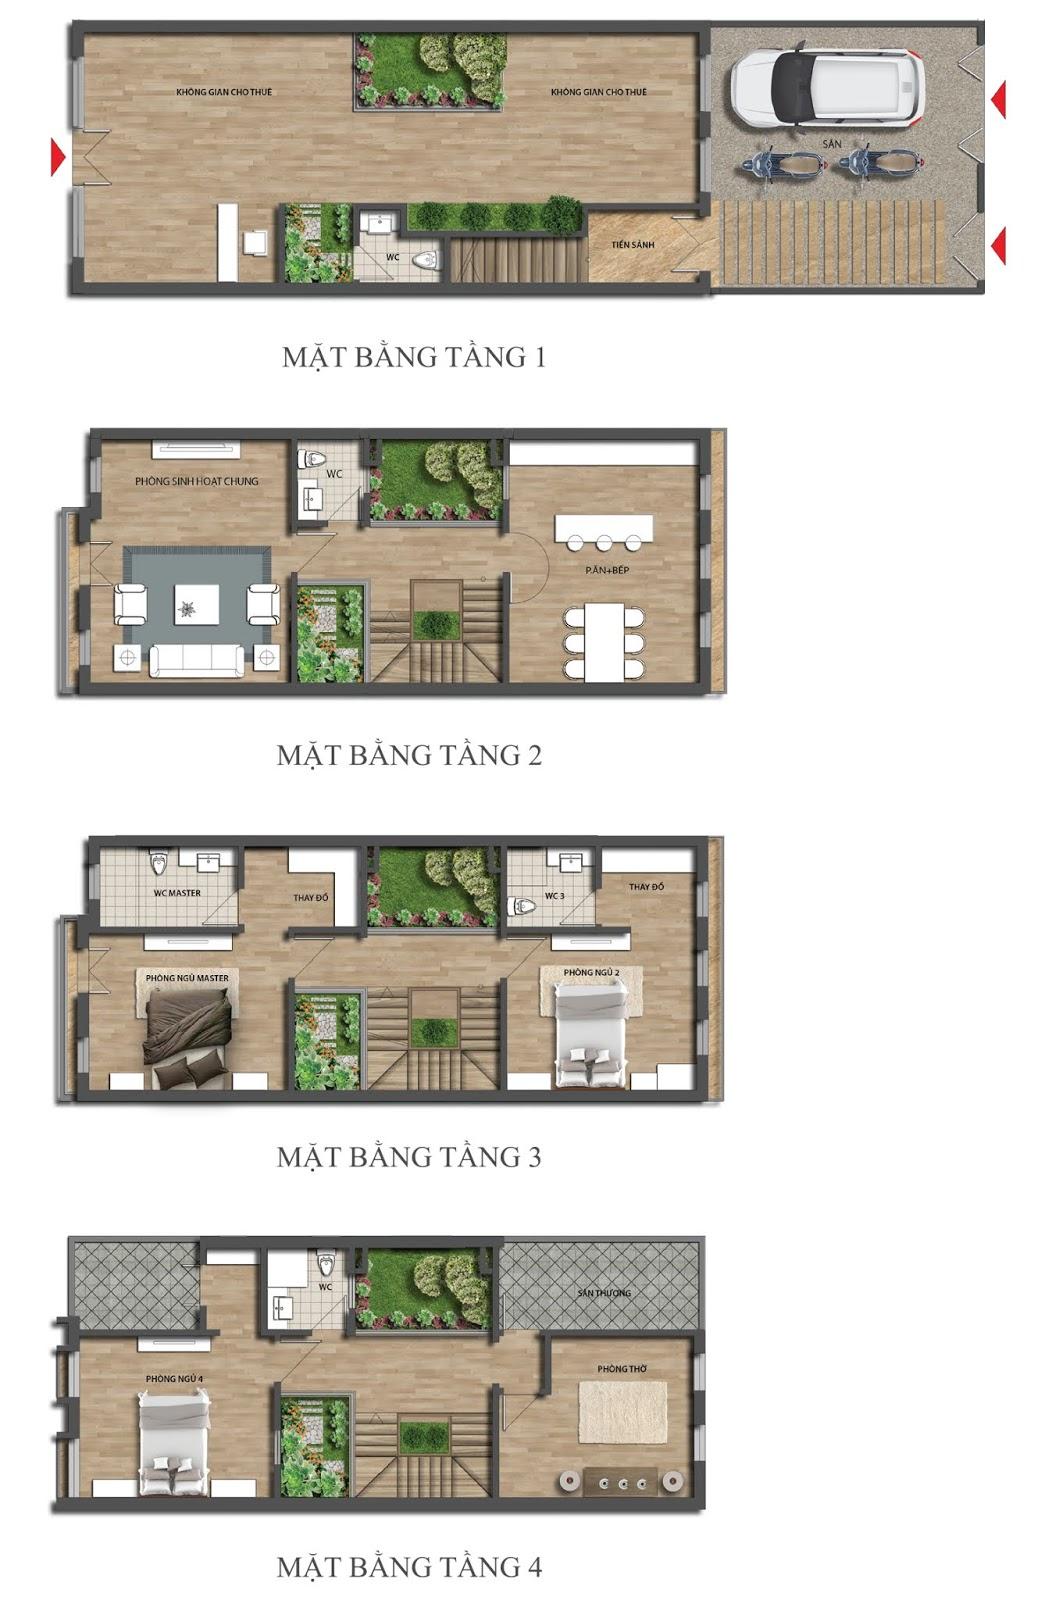 Thiết kế mặt bằng kinh doanh - Shophouse Embassy Garden mẫu SV01